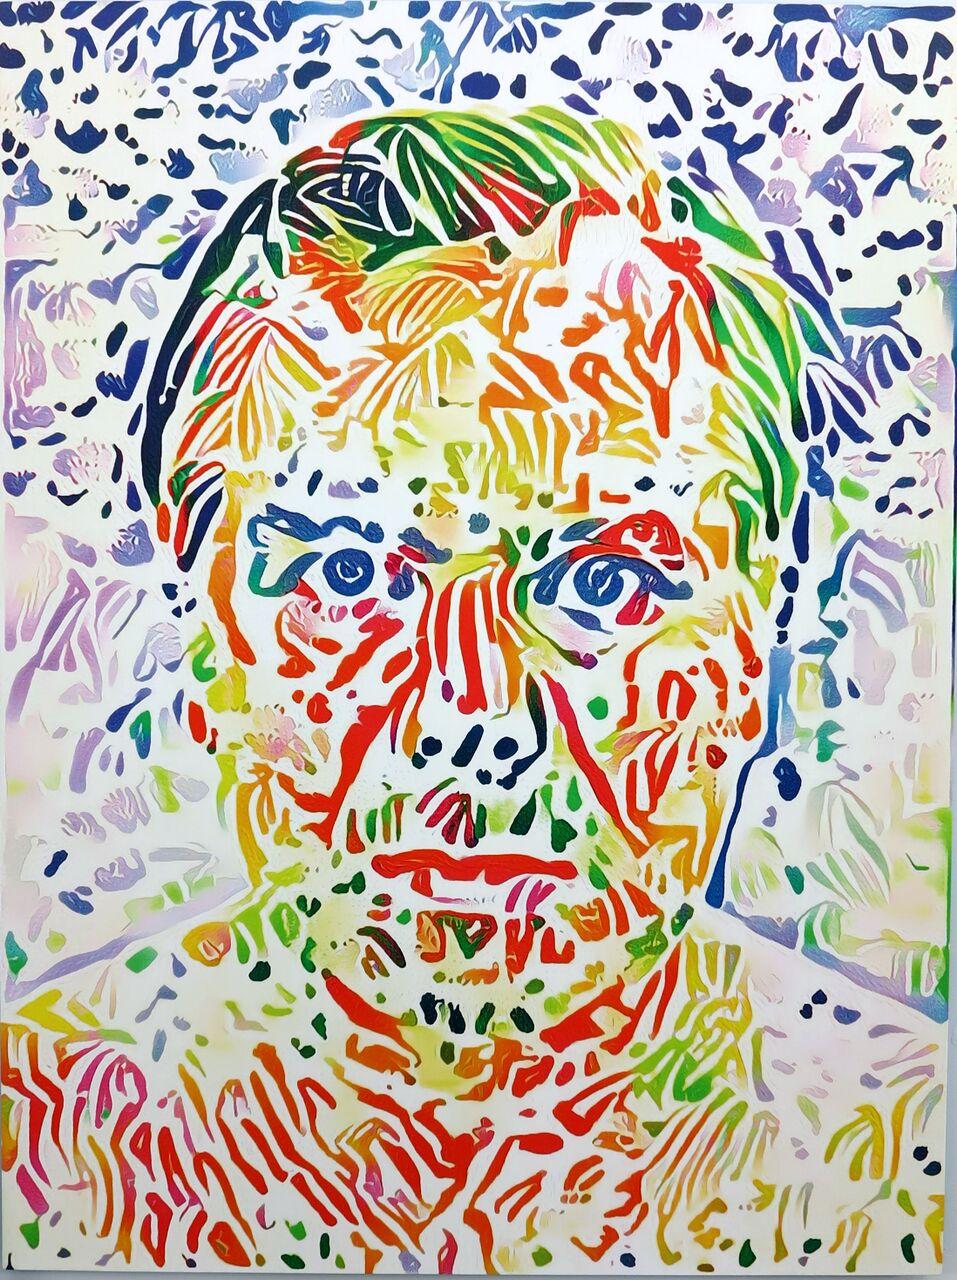 Artificial Intelligence Style Transfer Self-Portrait (Henri Matisse & My Face)